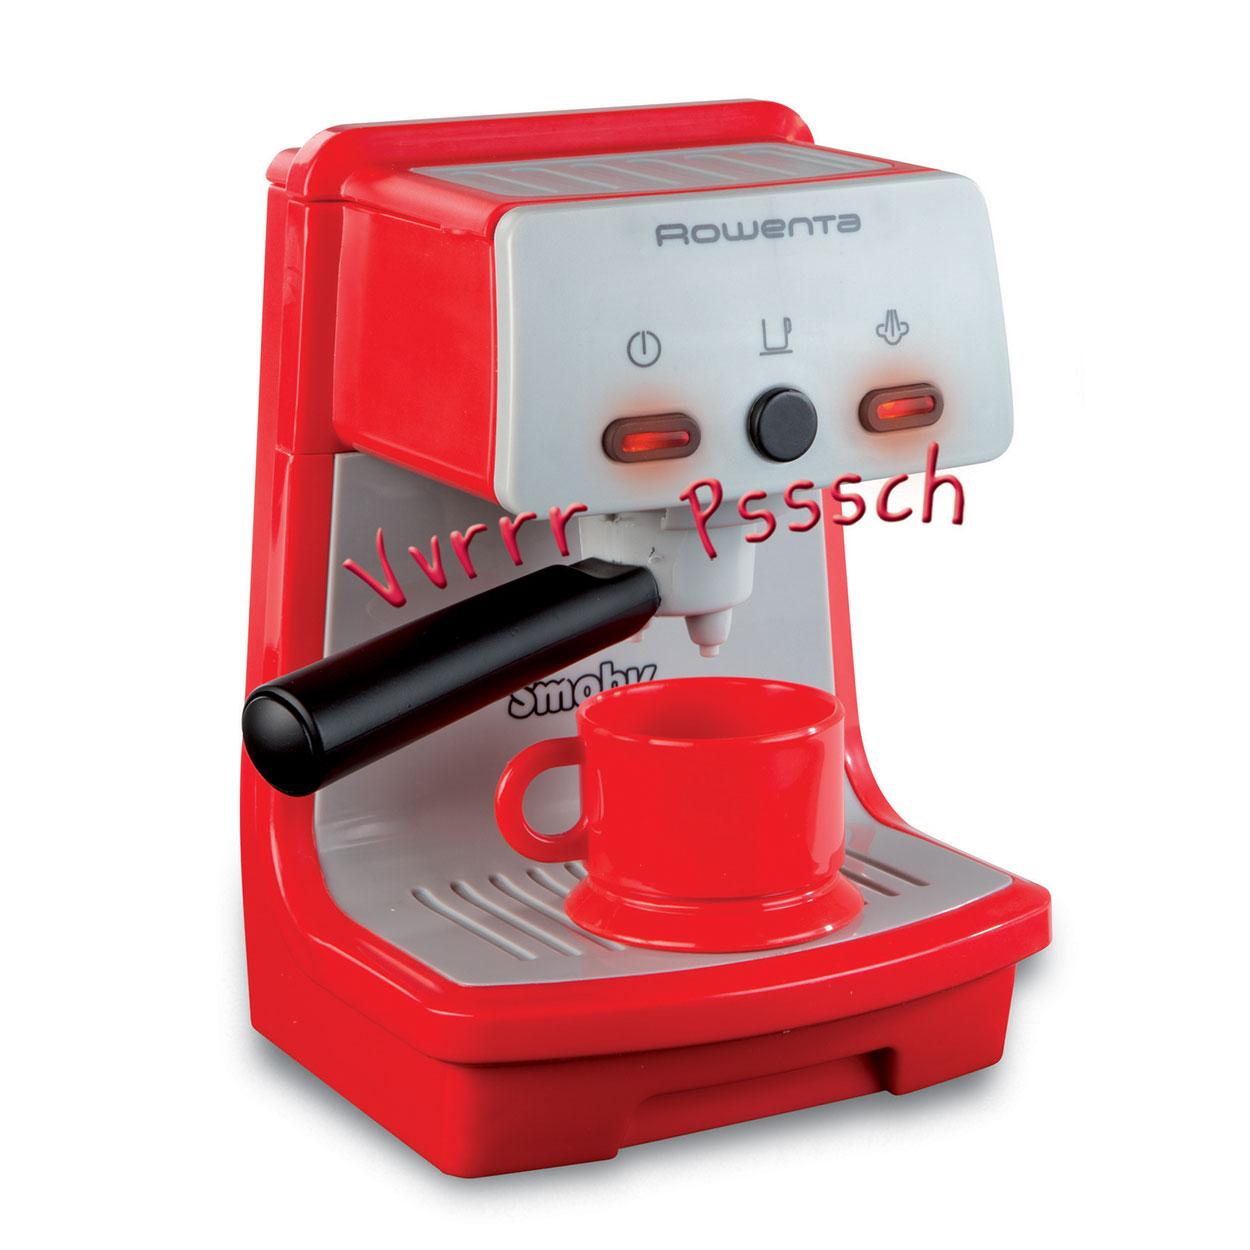 Smoby Rowenta Espresso Machine Espresso Machine Espresso And